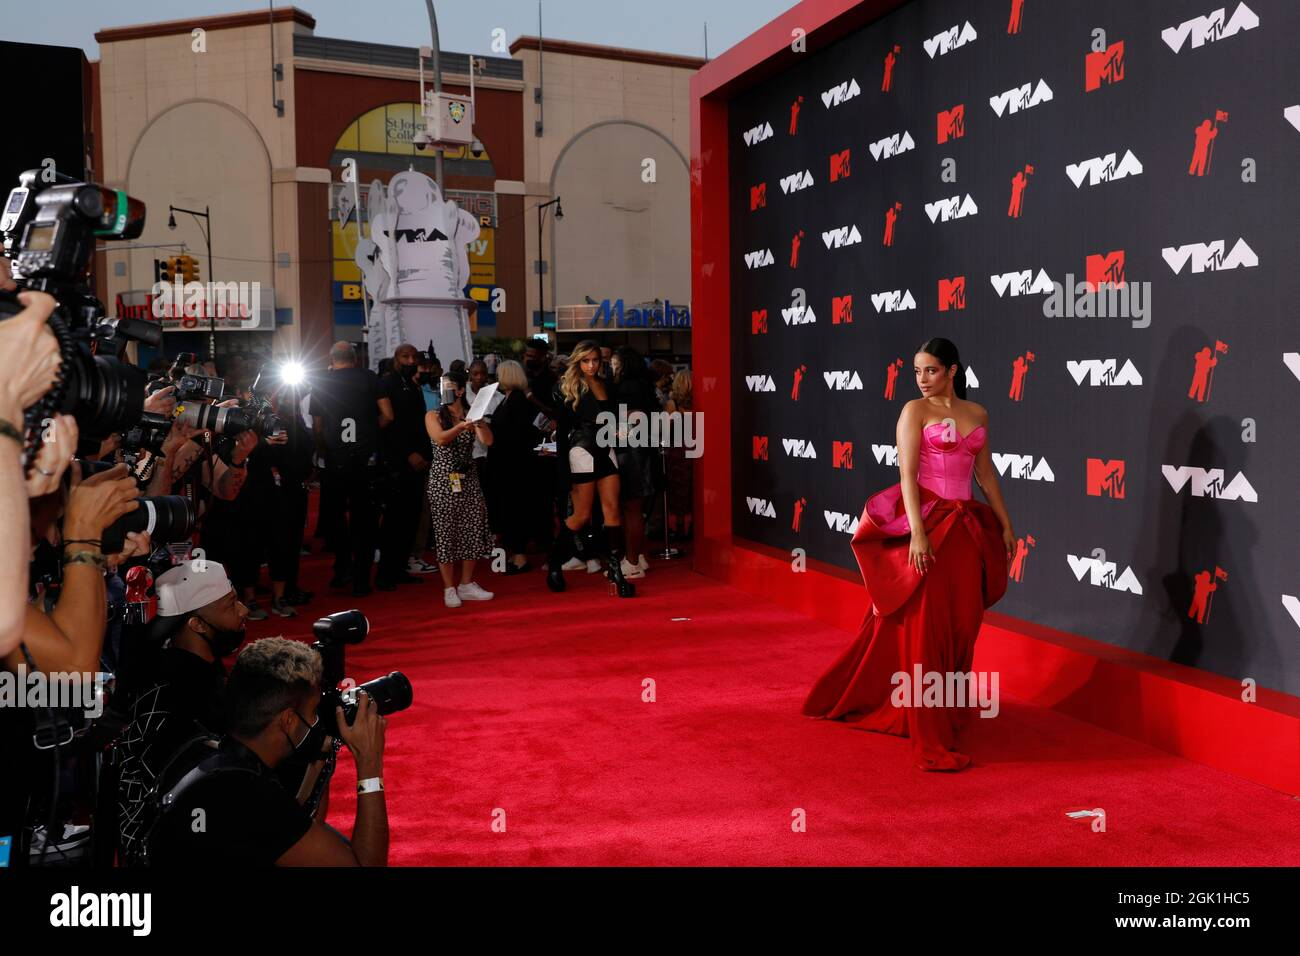 2021 MTV Video Music Awards - arrivées - Barclays Center, Brooklyn, New York, États-Unis, septembre 12, 2021 - Camila Cabello. REUTERS/Andrew Kelly Banque D'Images